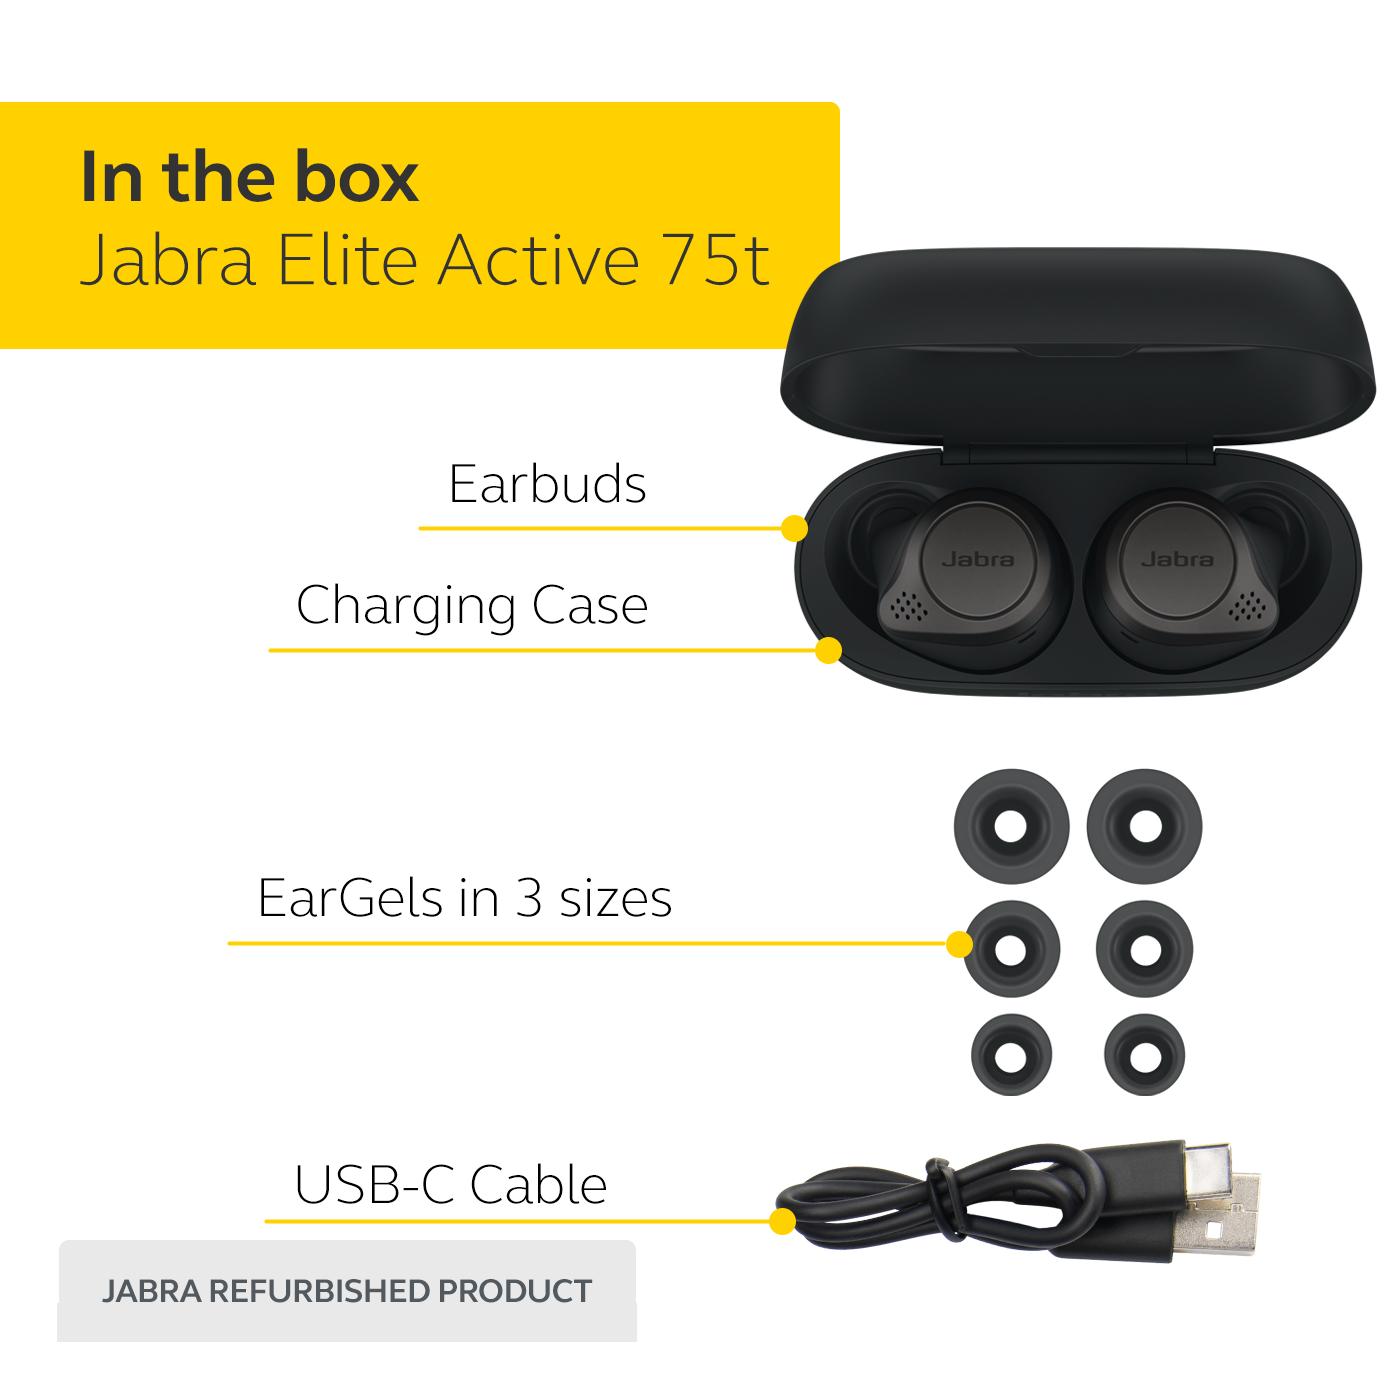 thumbnail 18 - Jabra Elite Active 75t True Wireless Earbuds Certified Refurbished